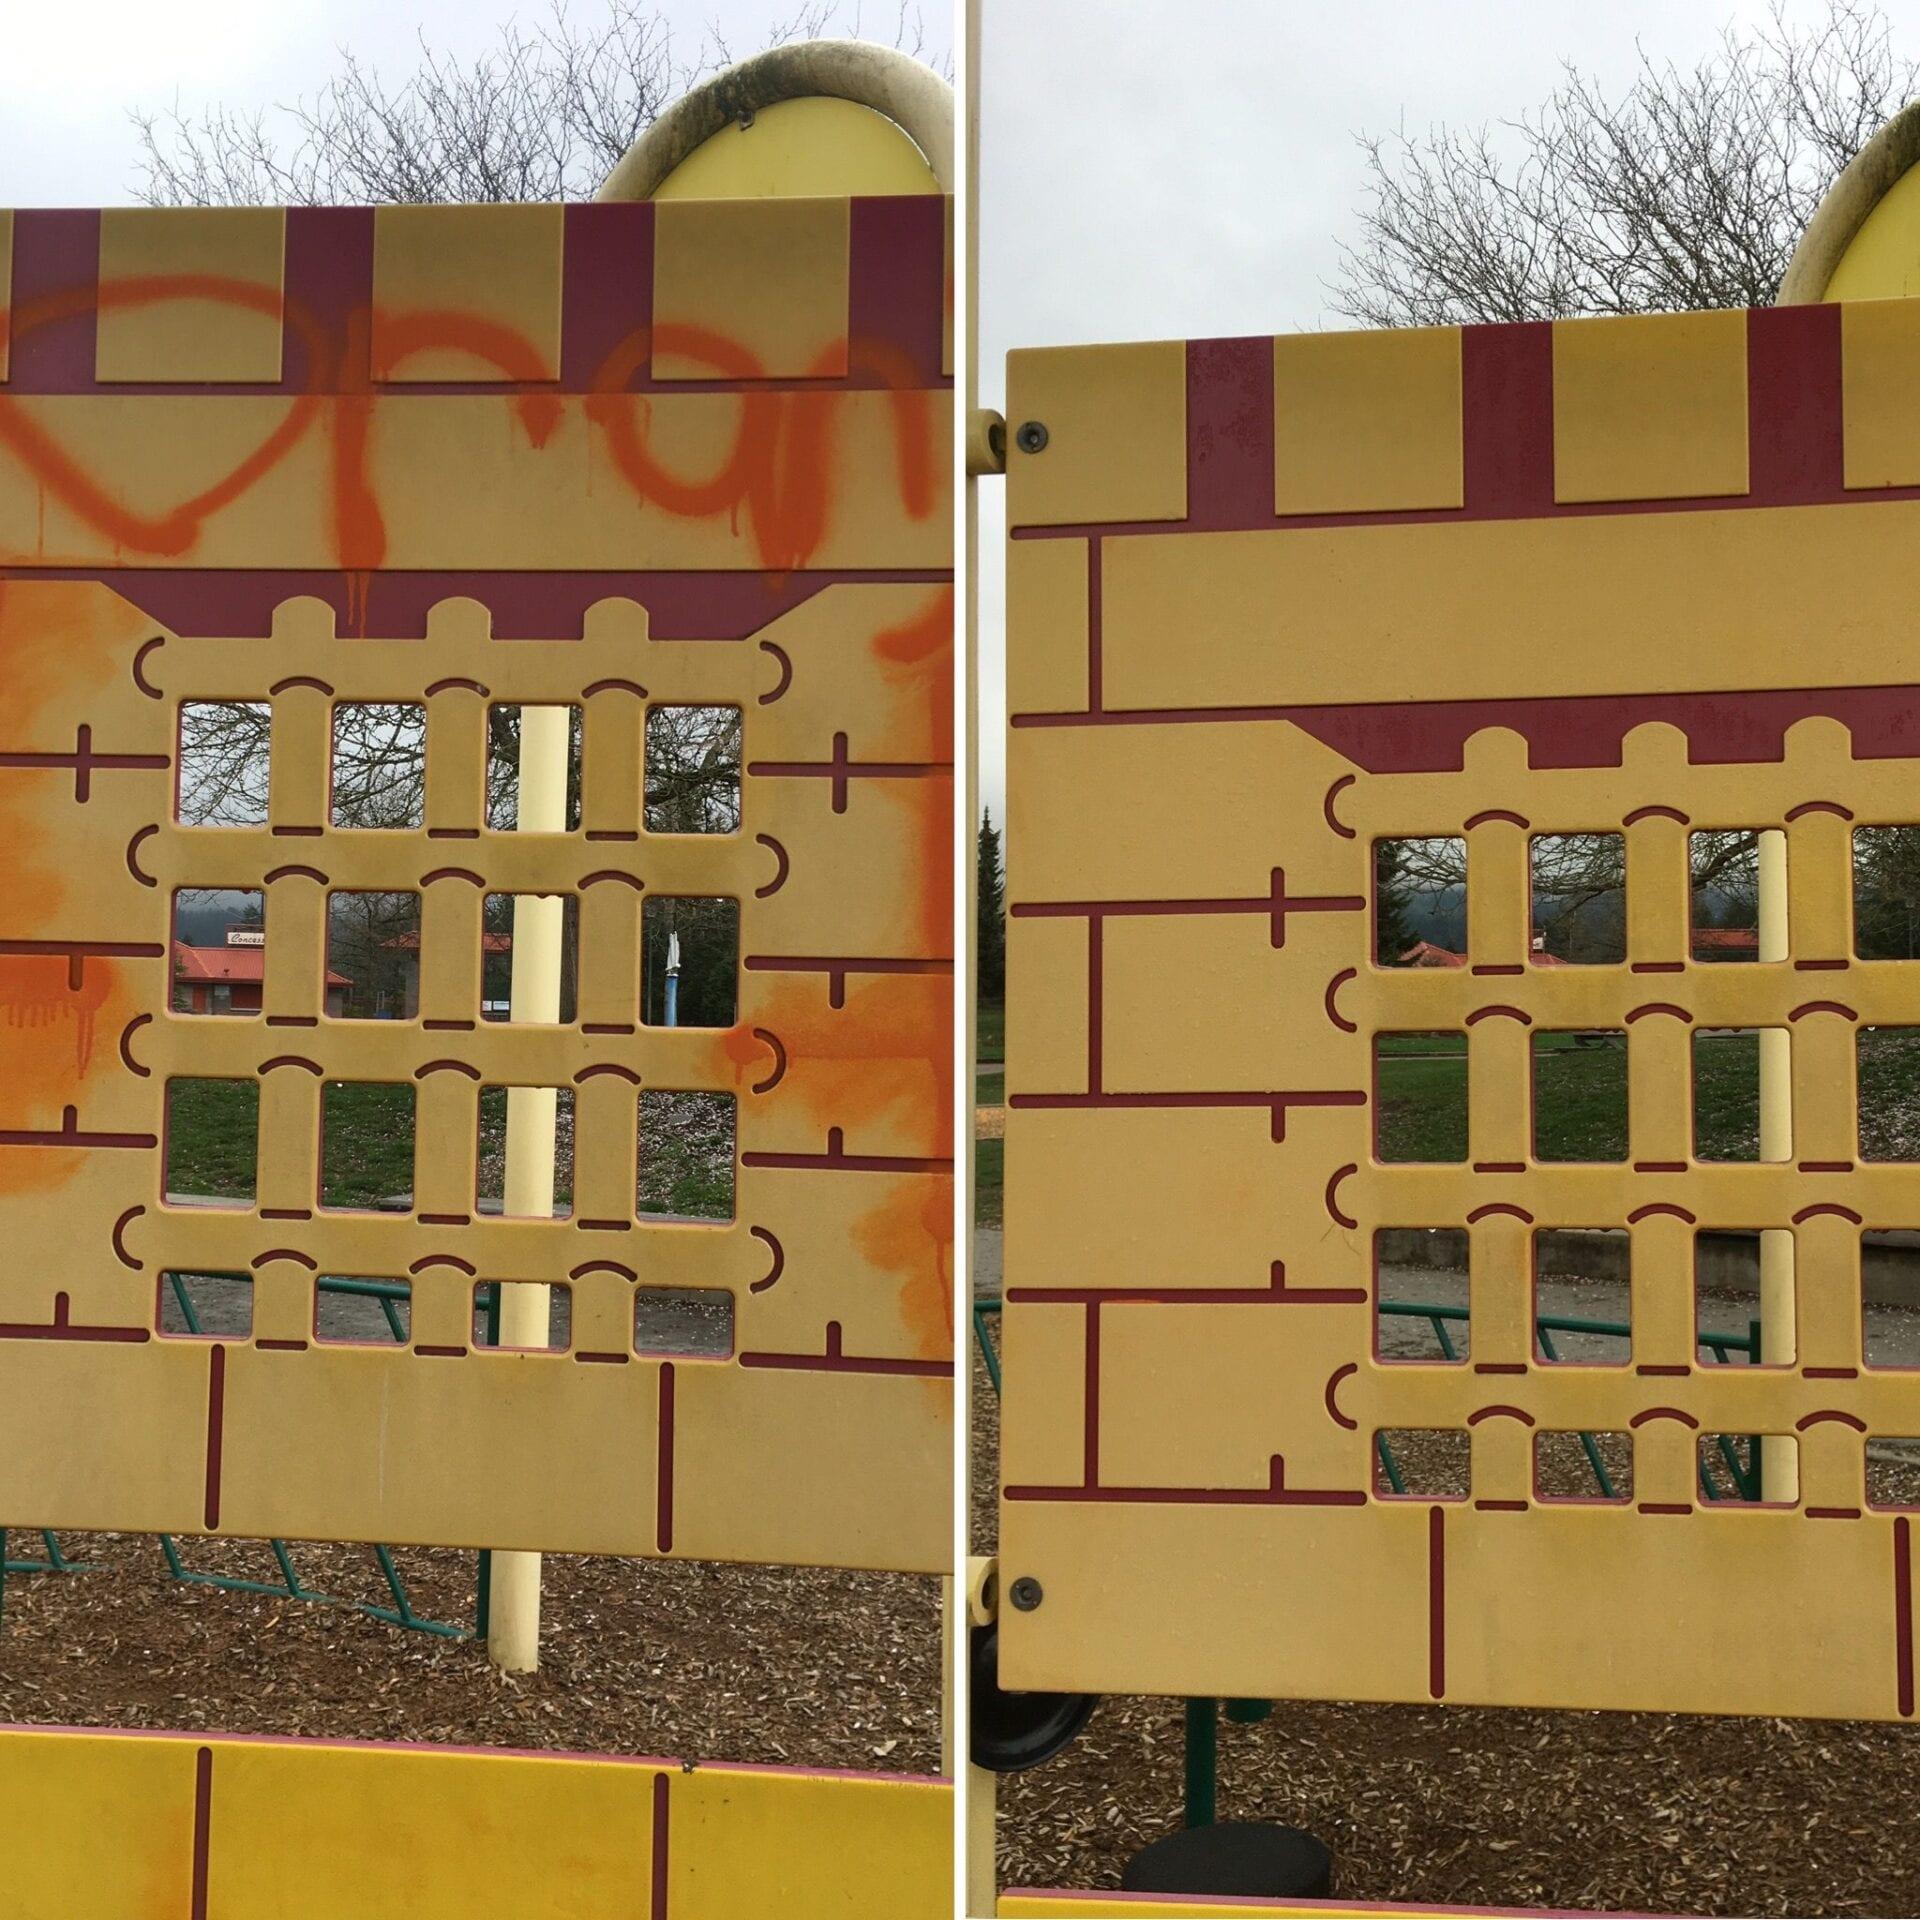 Main page - Graffiti removal